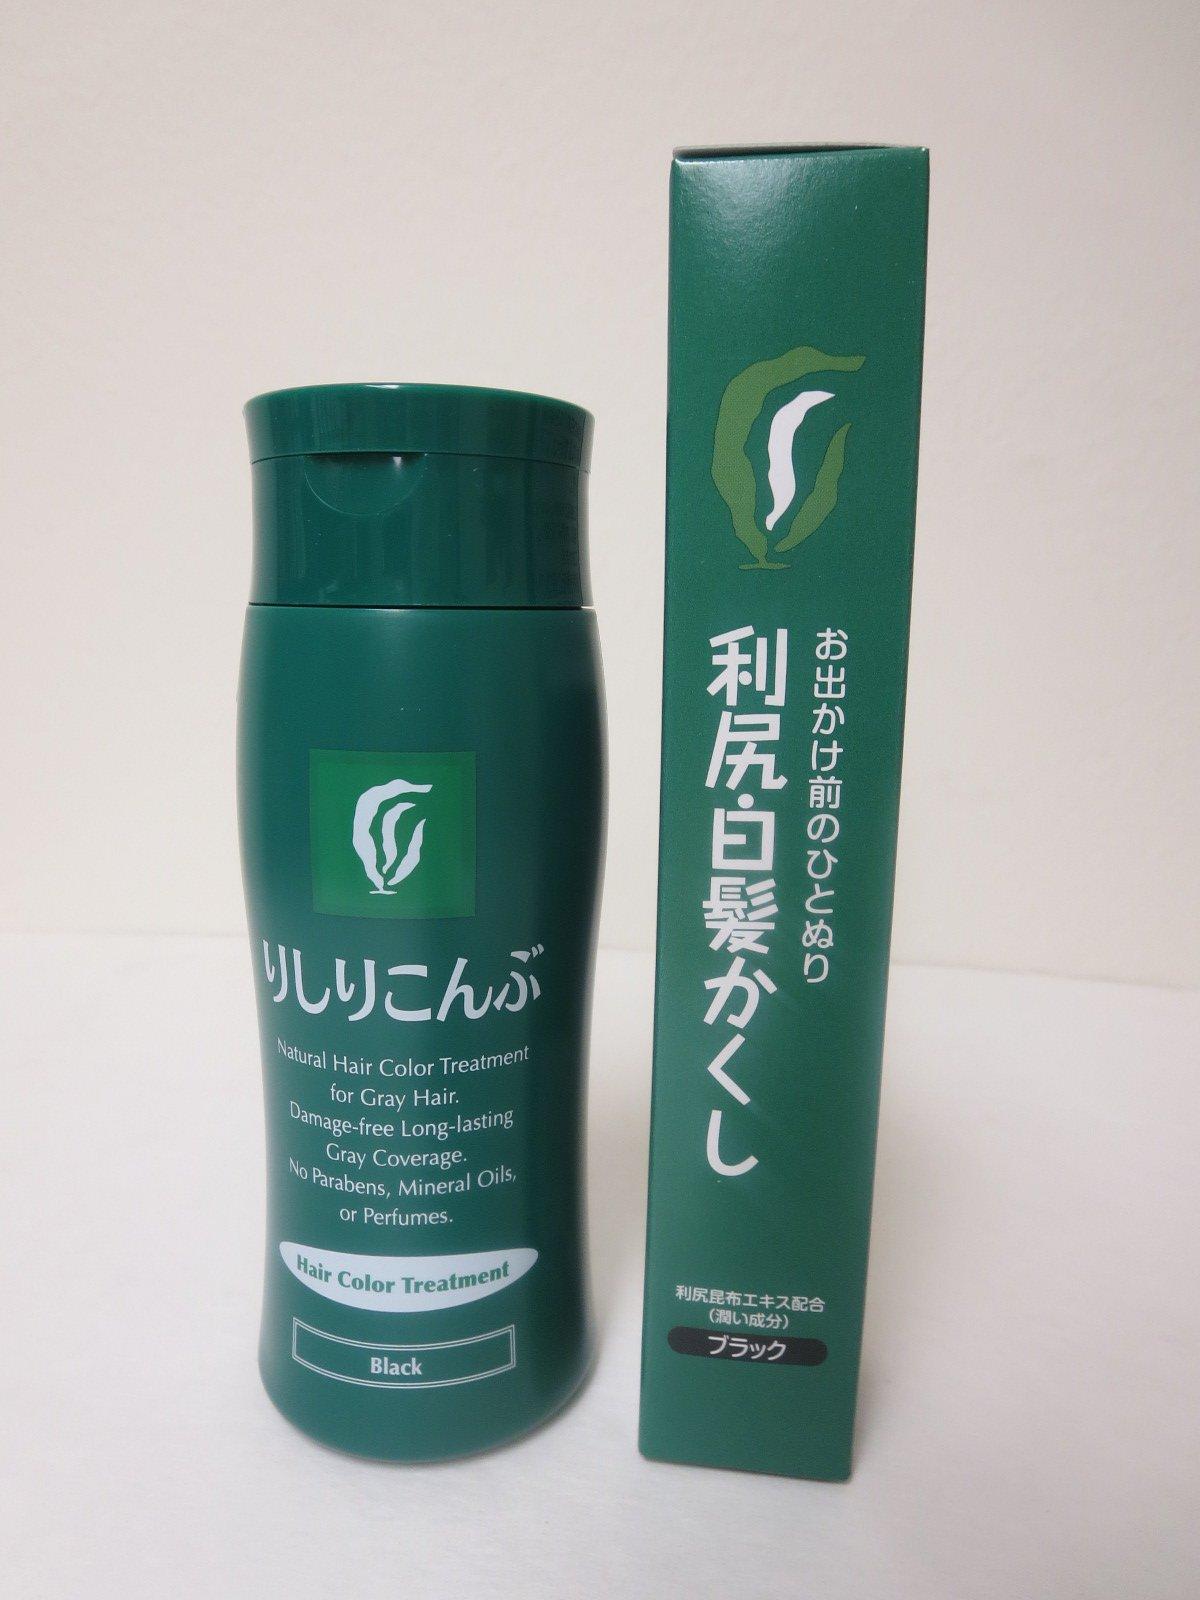 Rishiri Kombu Hair Color Treatment 200g Black +Hair Coloring Stick Black (0.7oz) set by Rishiri